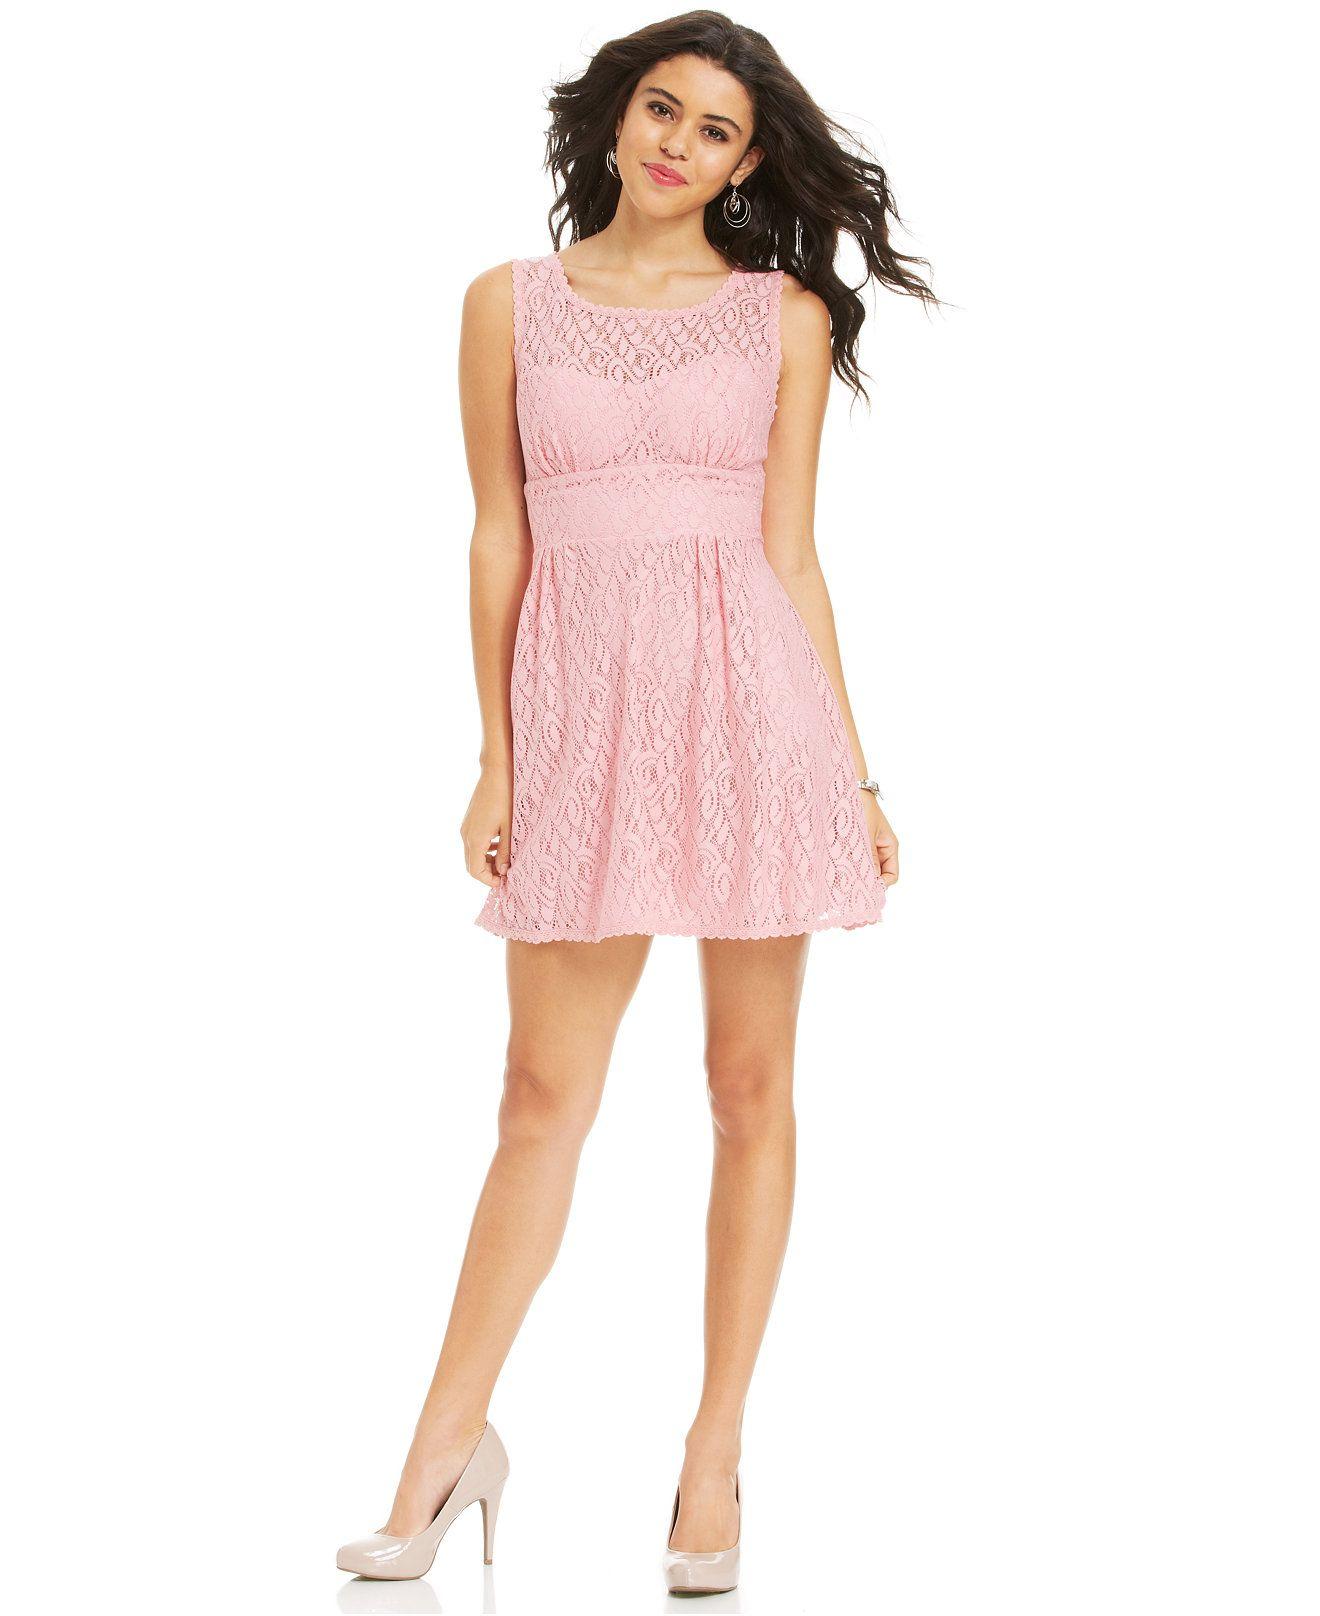 B Darlin Juniors\' Lace A-Line Illusion Dress - Juniors Dresses ...